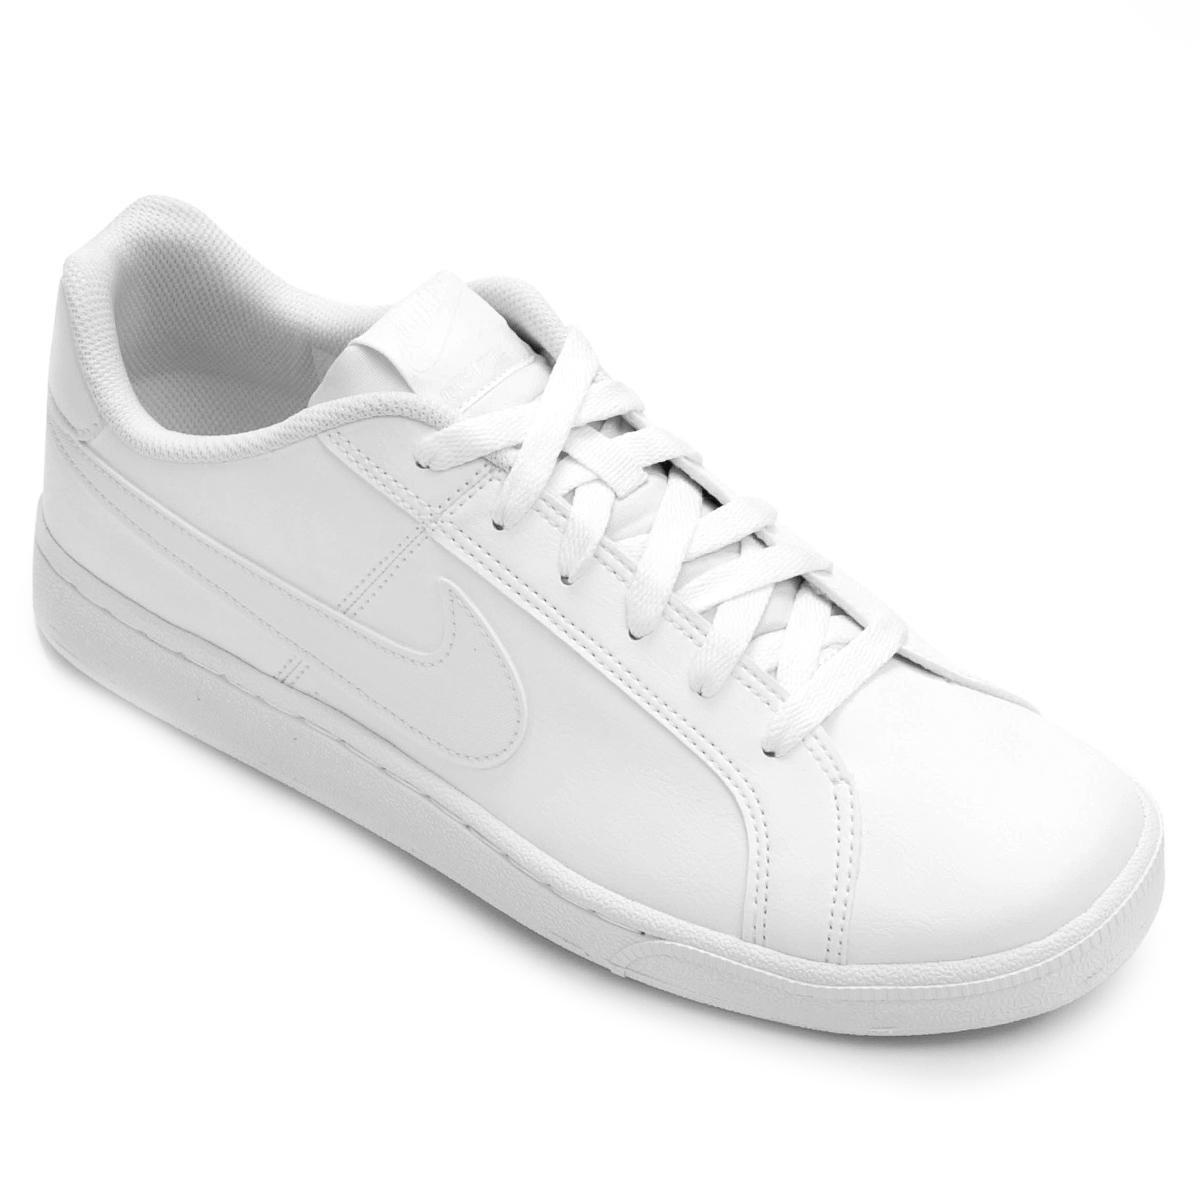 e3c90221511 Tênis Couro Nike Court Royale Masculino - Branco - Compre Agora ...